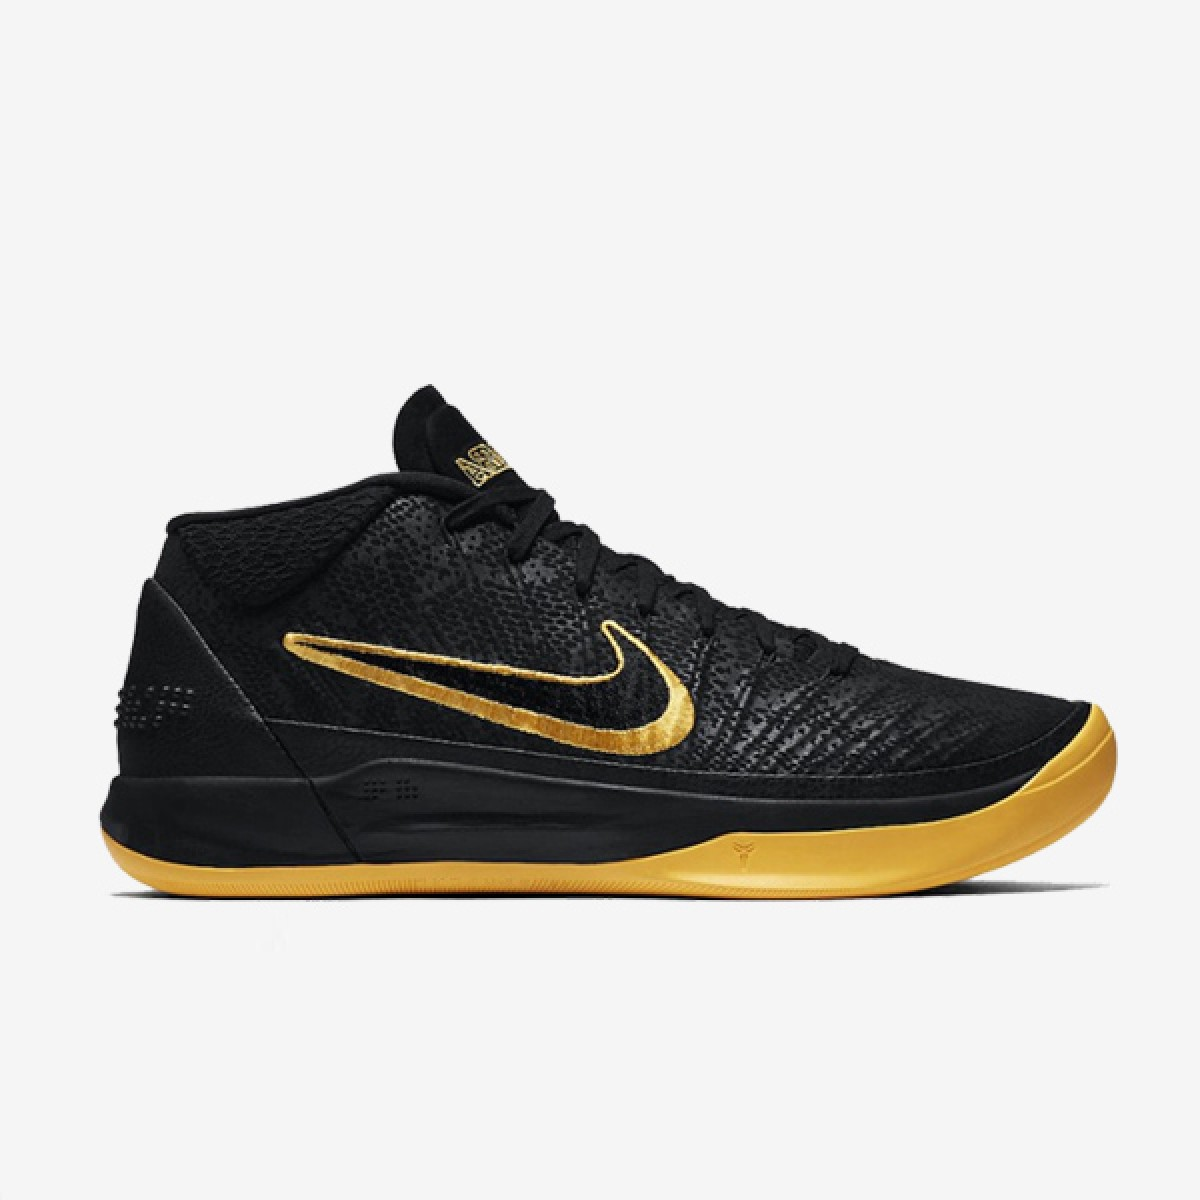 Nike Kobe AD Mid 'Black Mamba'